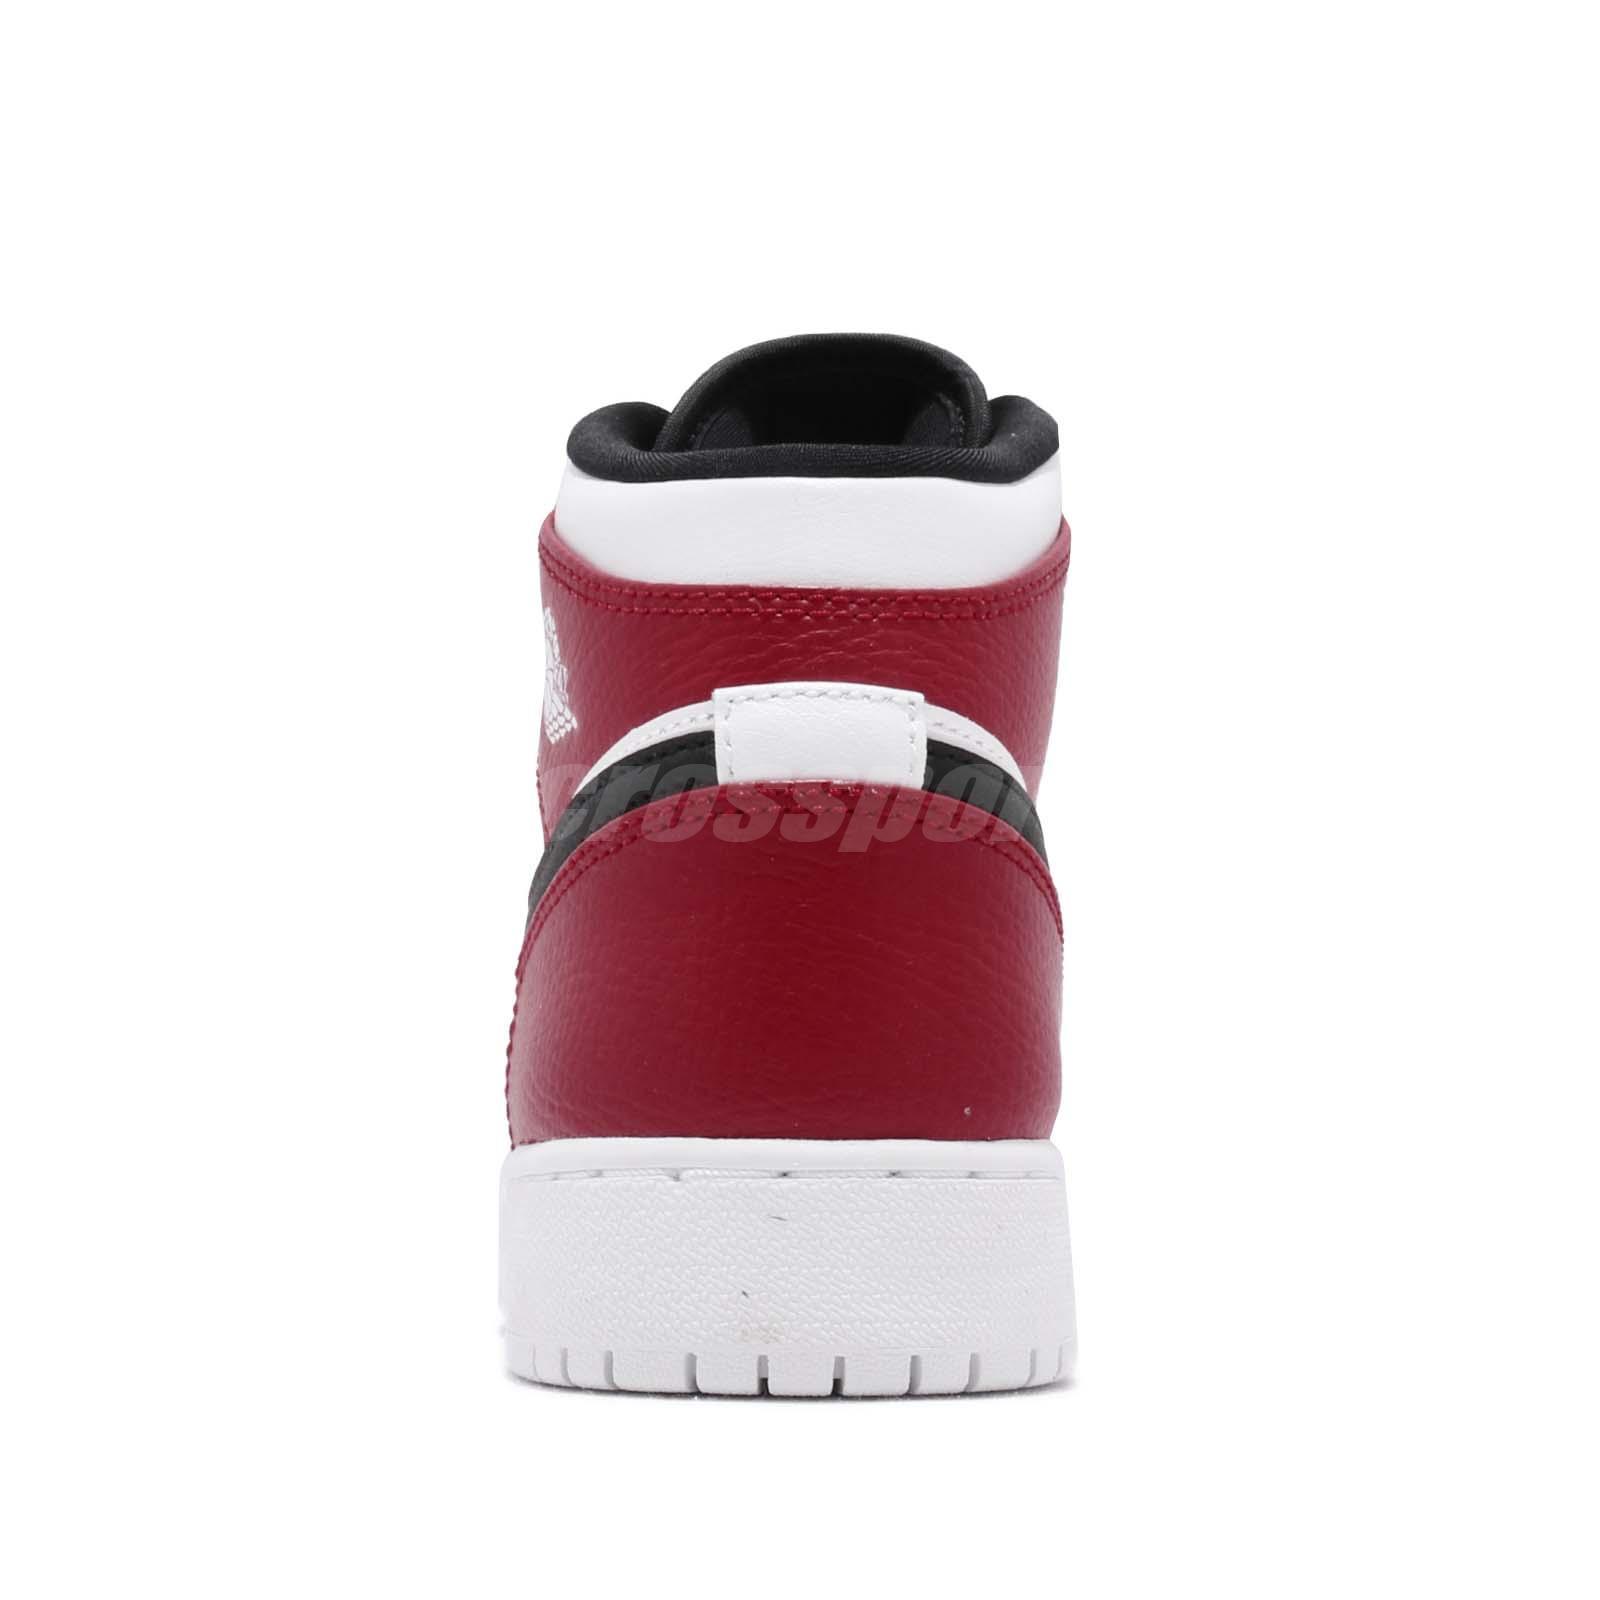 9a5d2825fb7314 Nike Air Jordan 1 Mid GS White Black Gym Red Chicago Kids Womens AJ1 ...